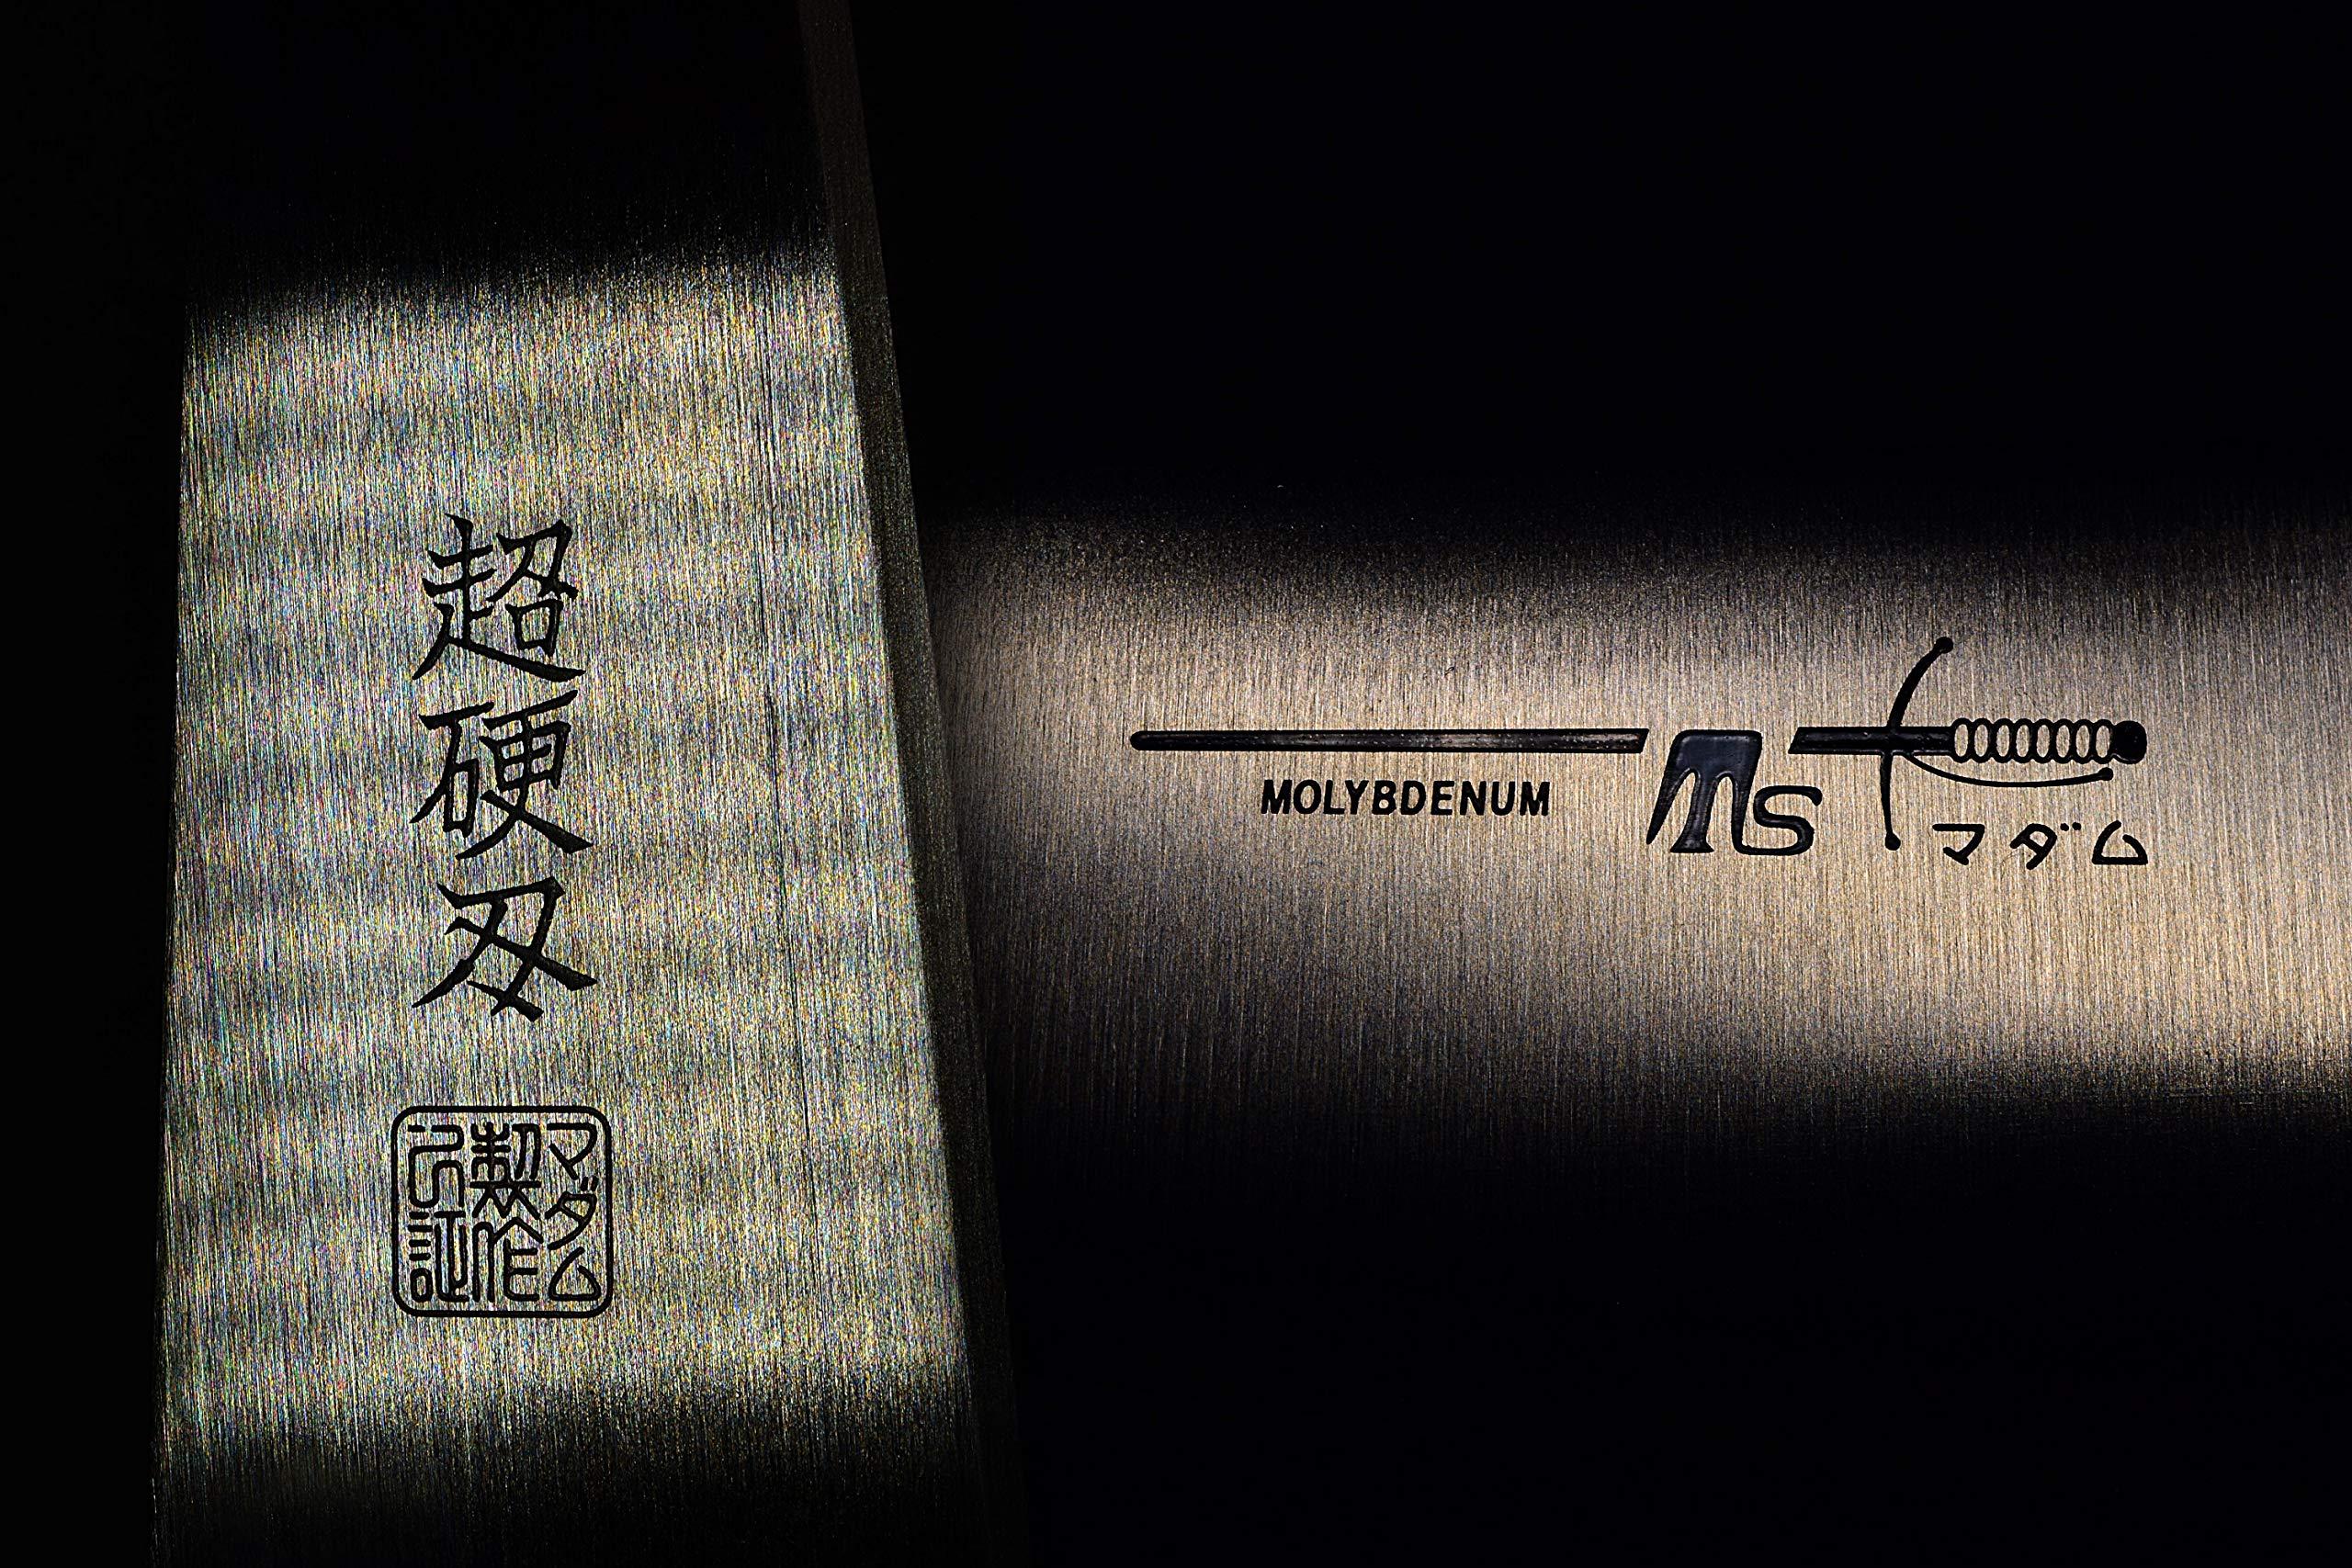 Seki Japan Sushi Chef Knife, Japanese Sashimi Deba knife, AUS-8 High Carbon Stainless Steel, Straight Edge Stamped Knife, 5.3 inch (135mm) by seki japan (Image #5)